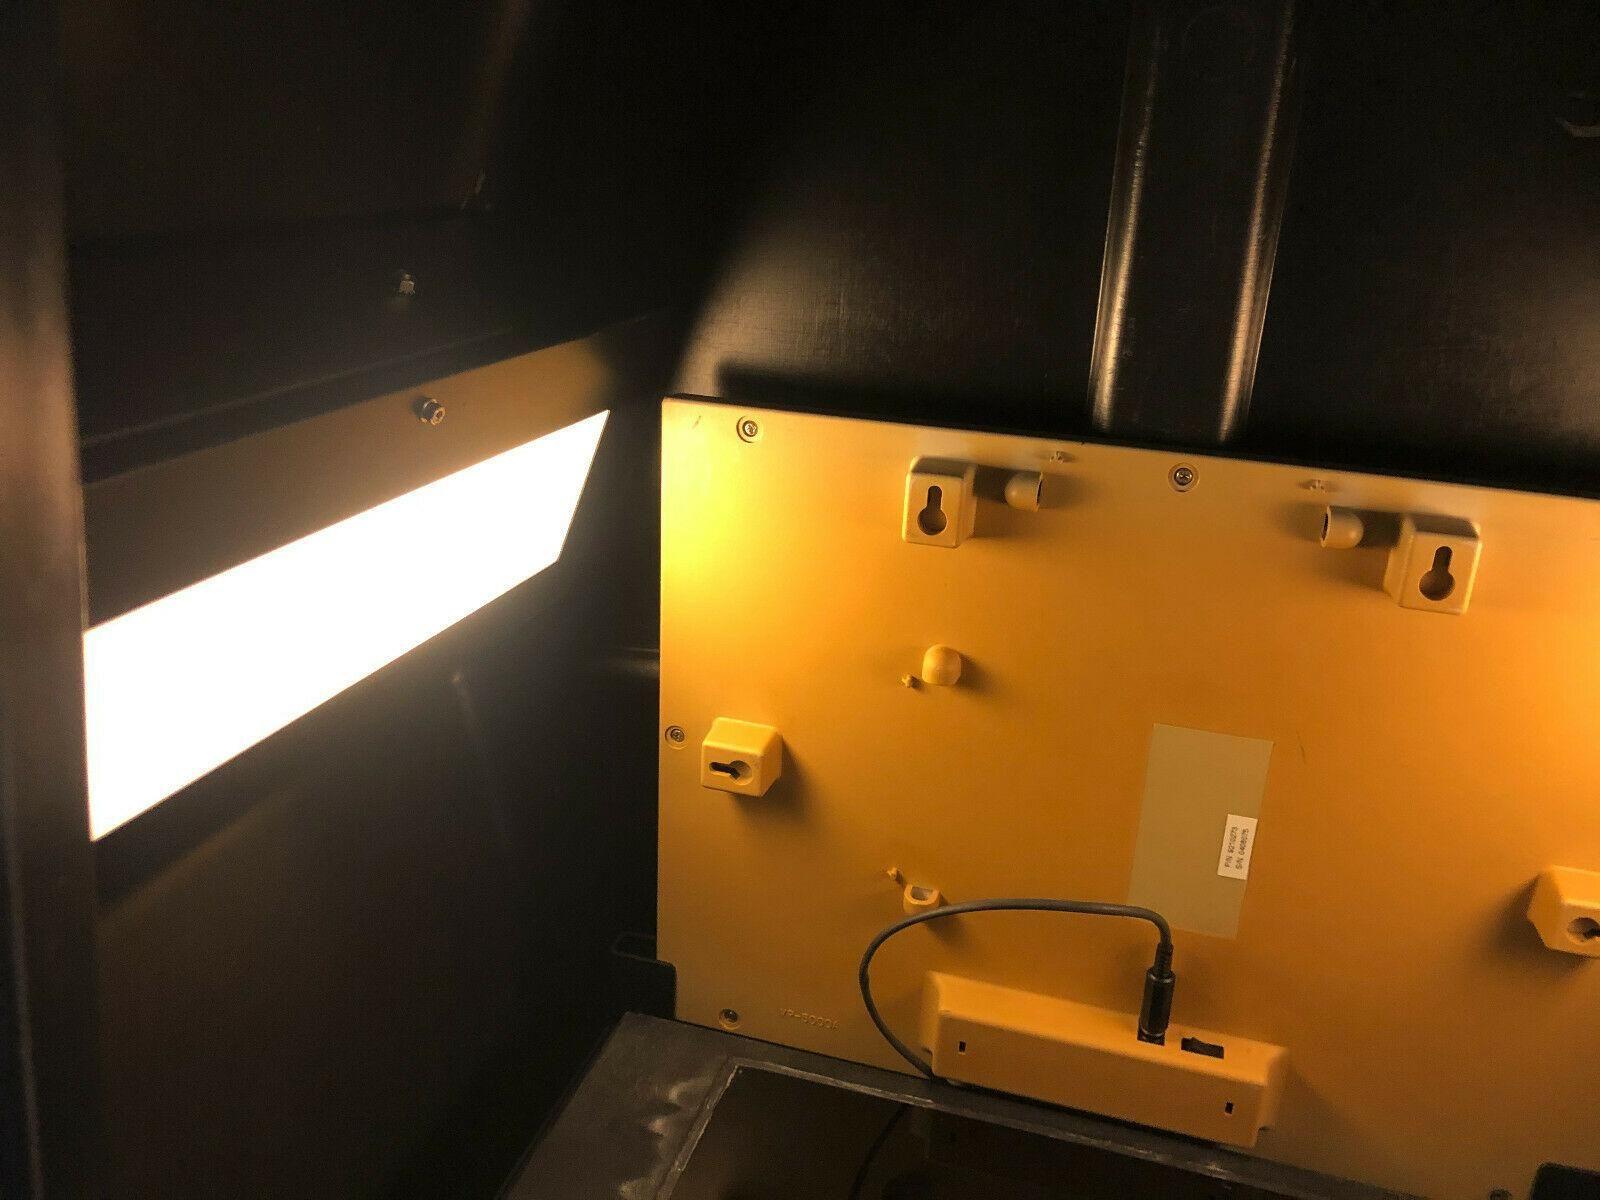 Biorad Gel Doc XR+ ChemiDoc XRS+ Lot of 2 Lamp, 5 Watt, EPI White Light